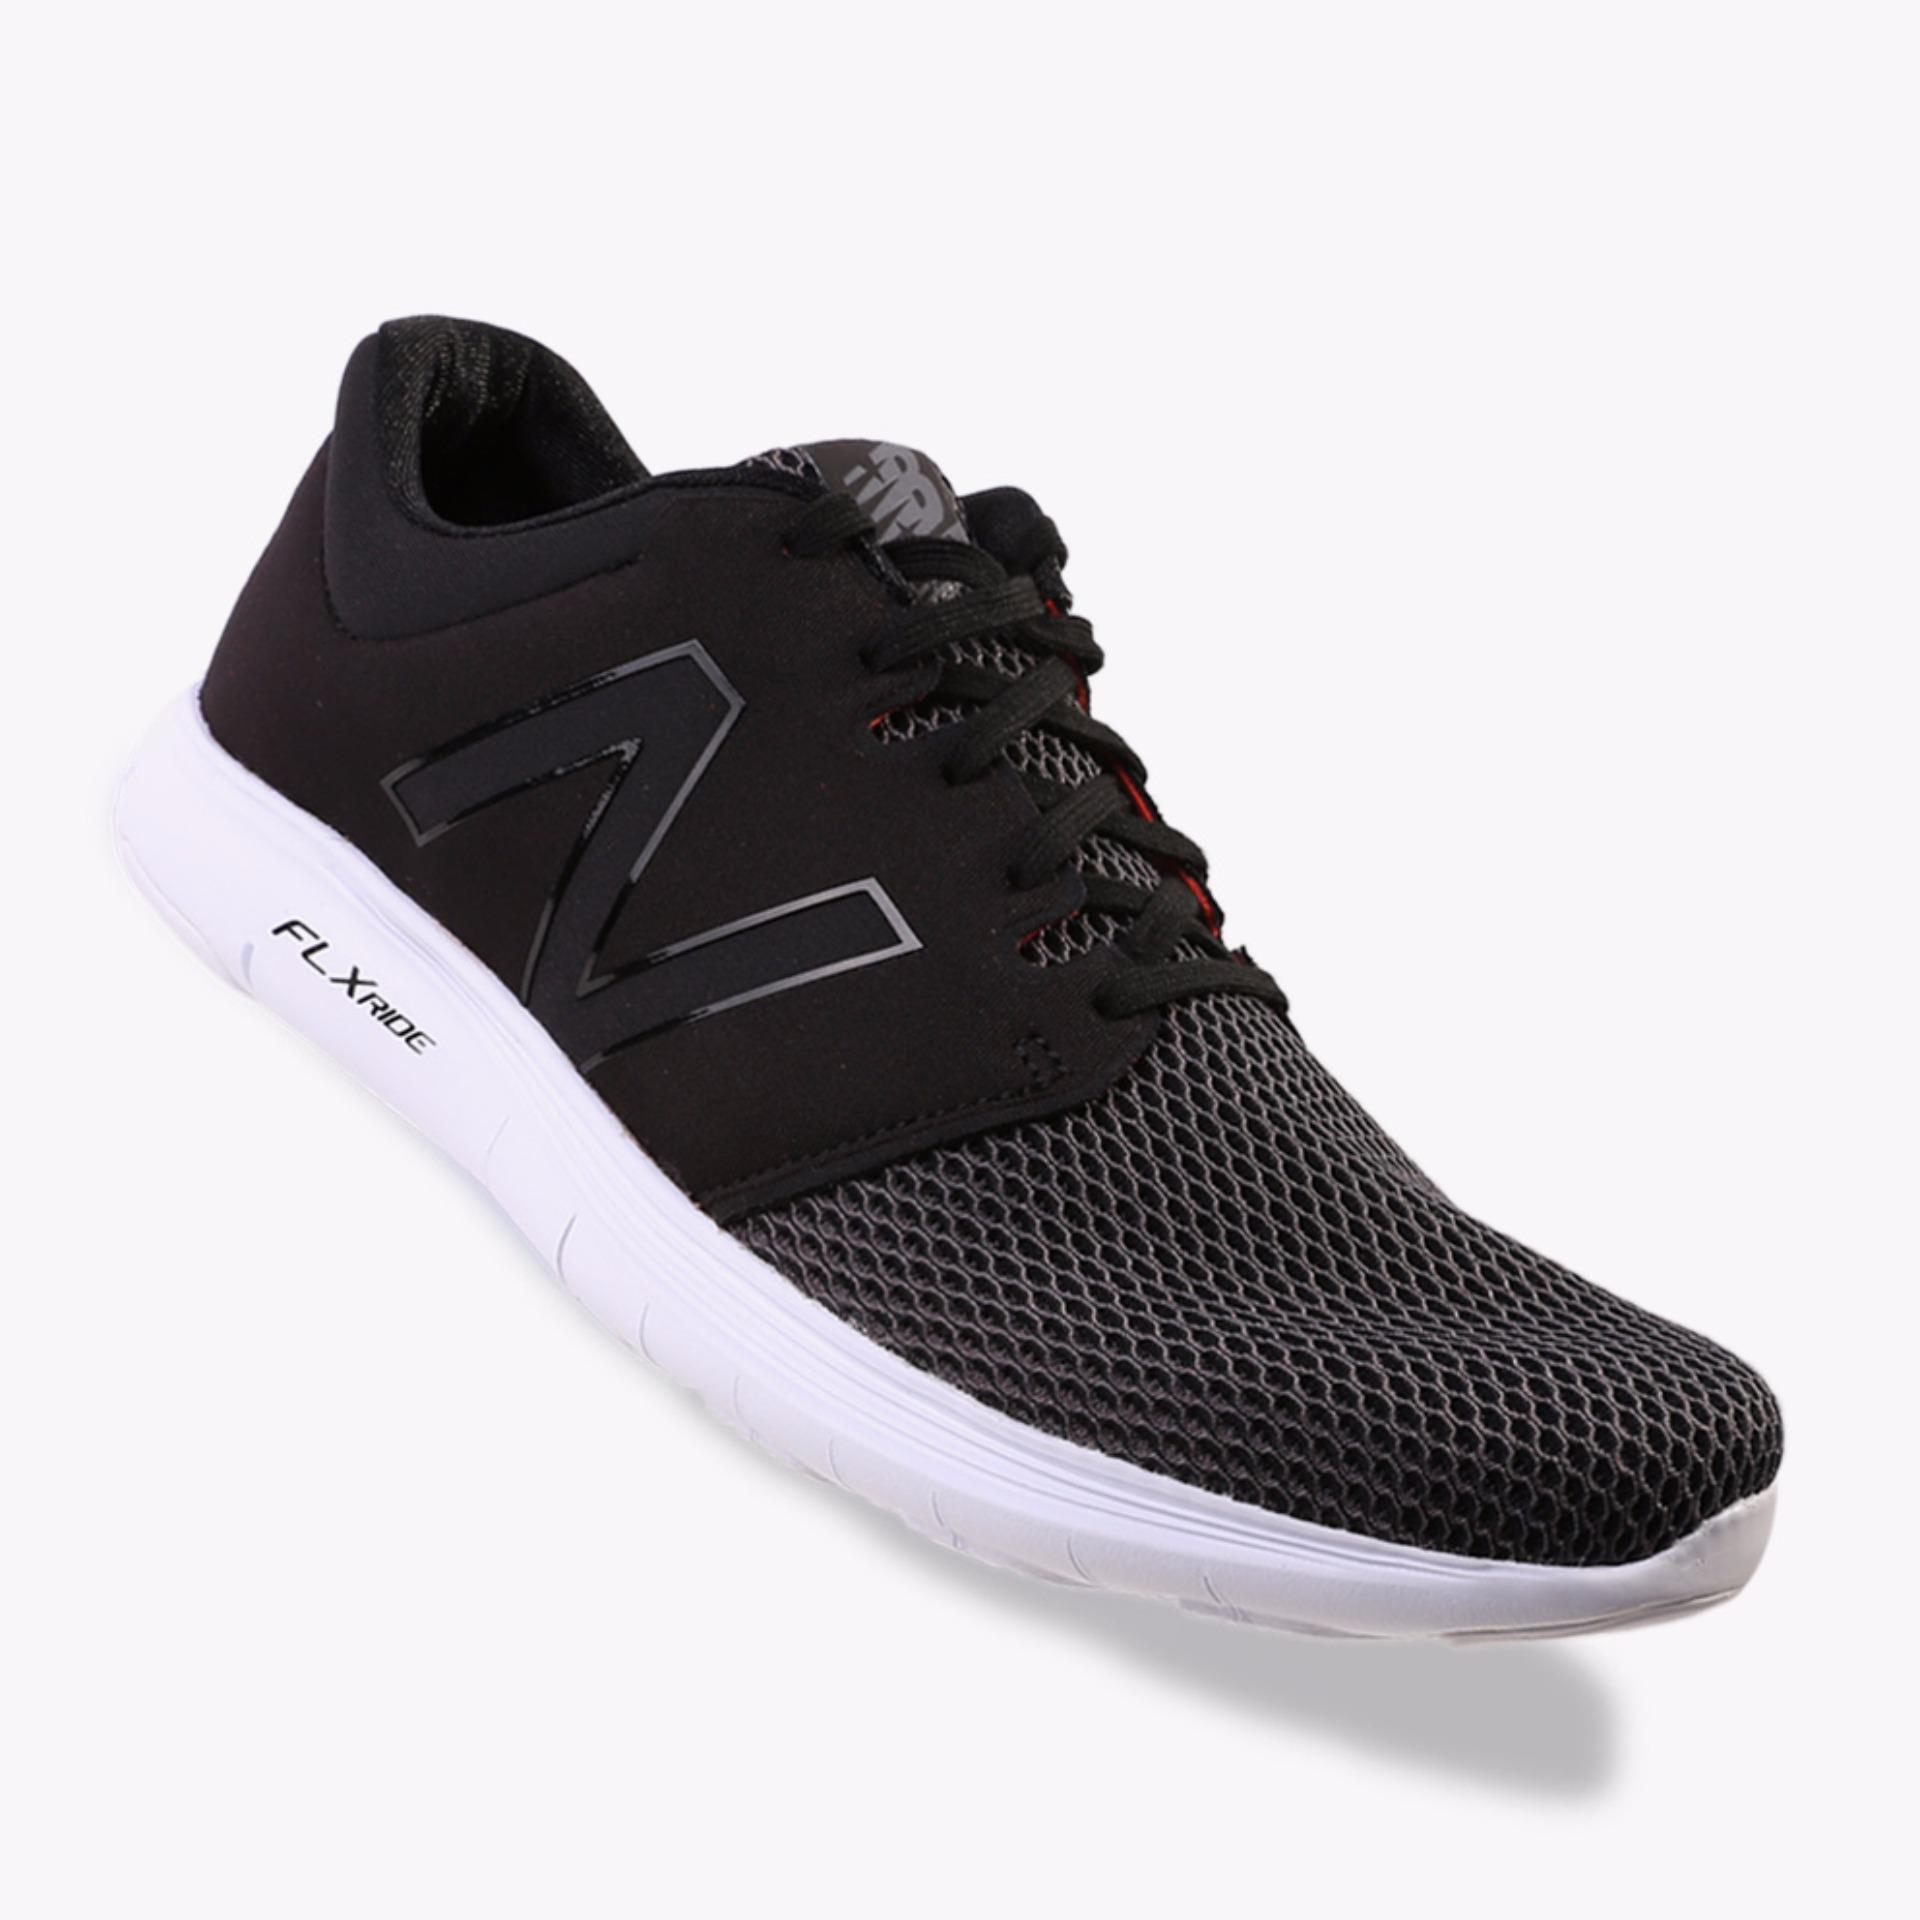 Jual New Balance Flex Ride 530 V2 Men S Running Shoes Abu Abu Termurah